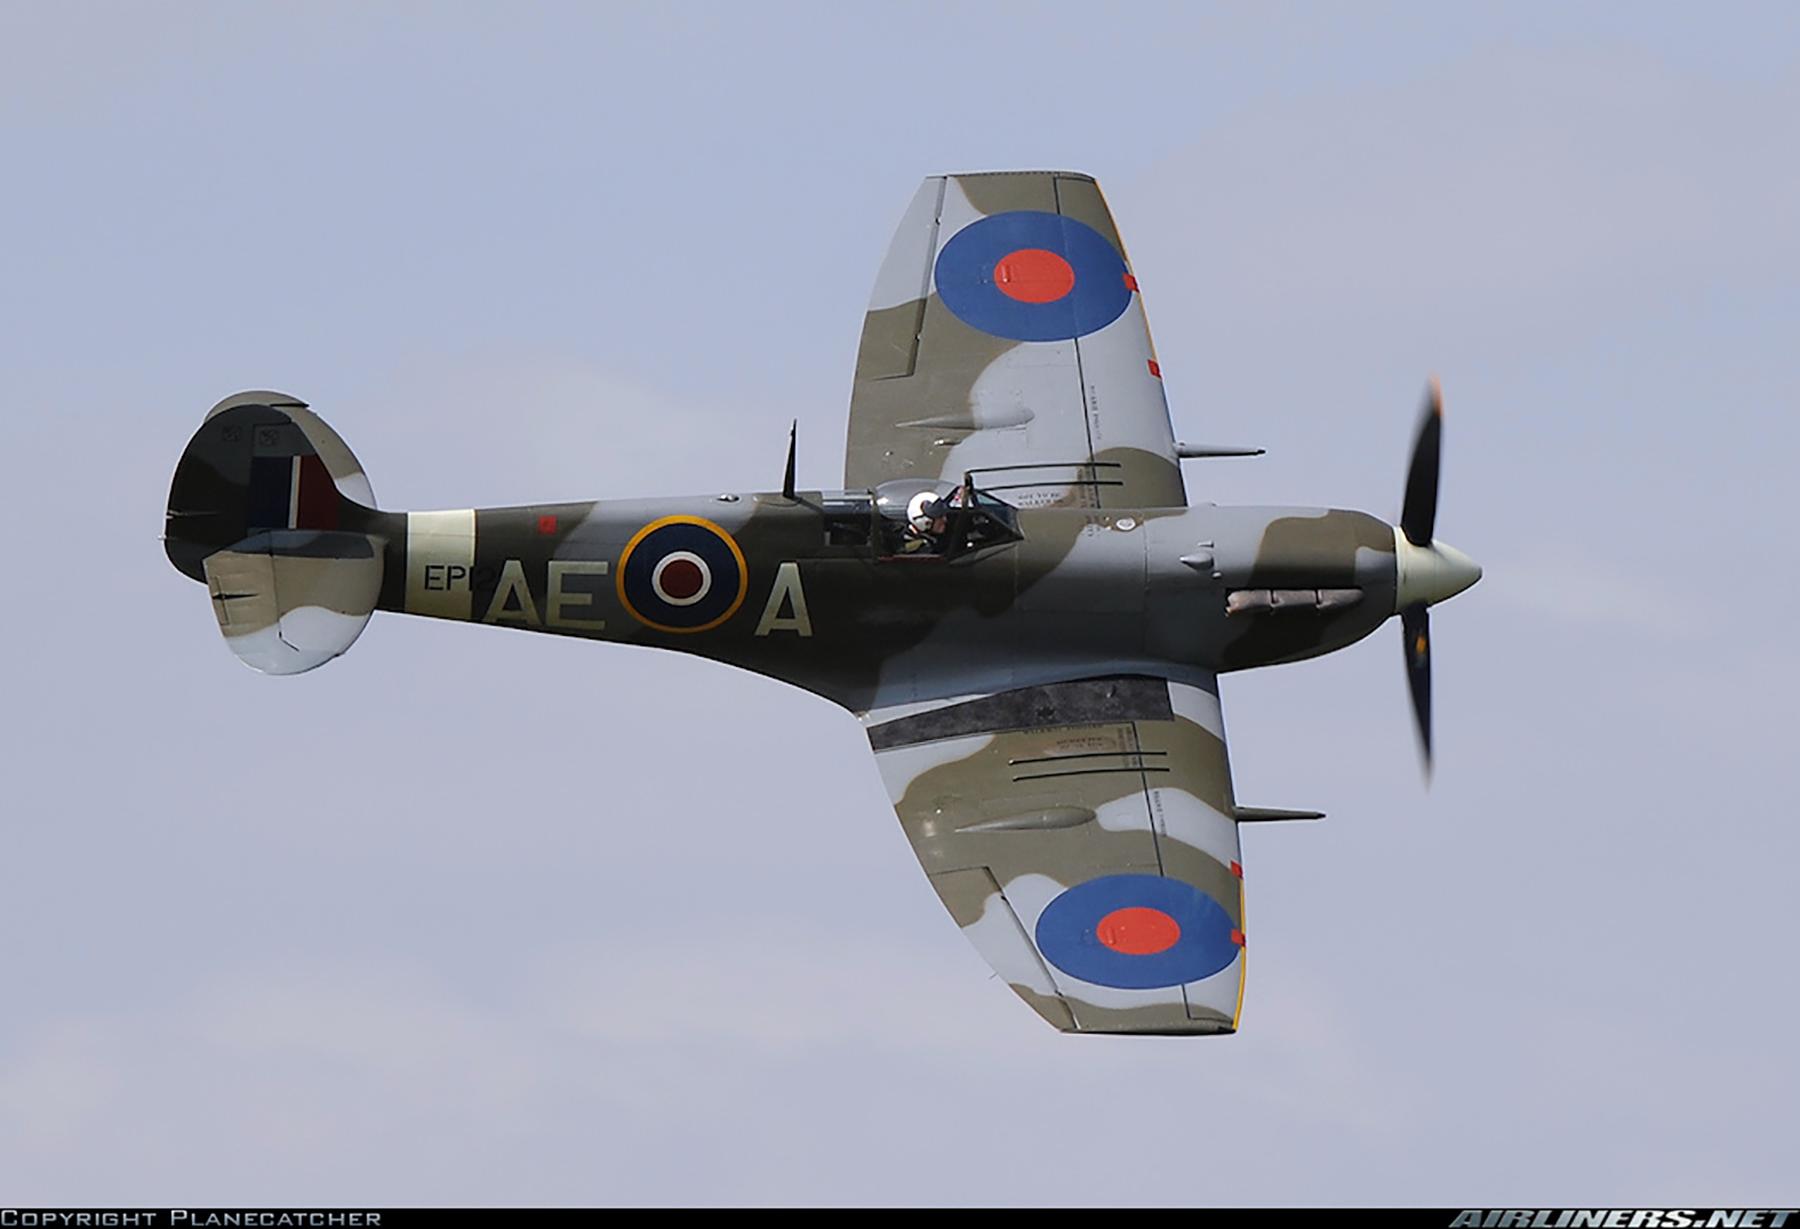 Airworthy Spitfire warbird LFVb RCAF 402Sqn AEA EP120 12